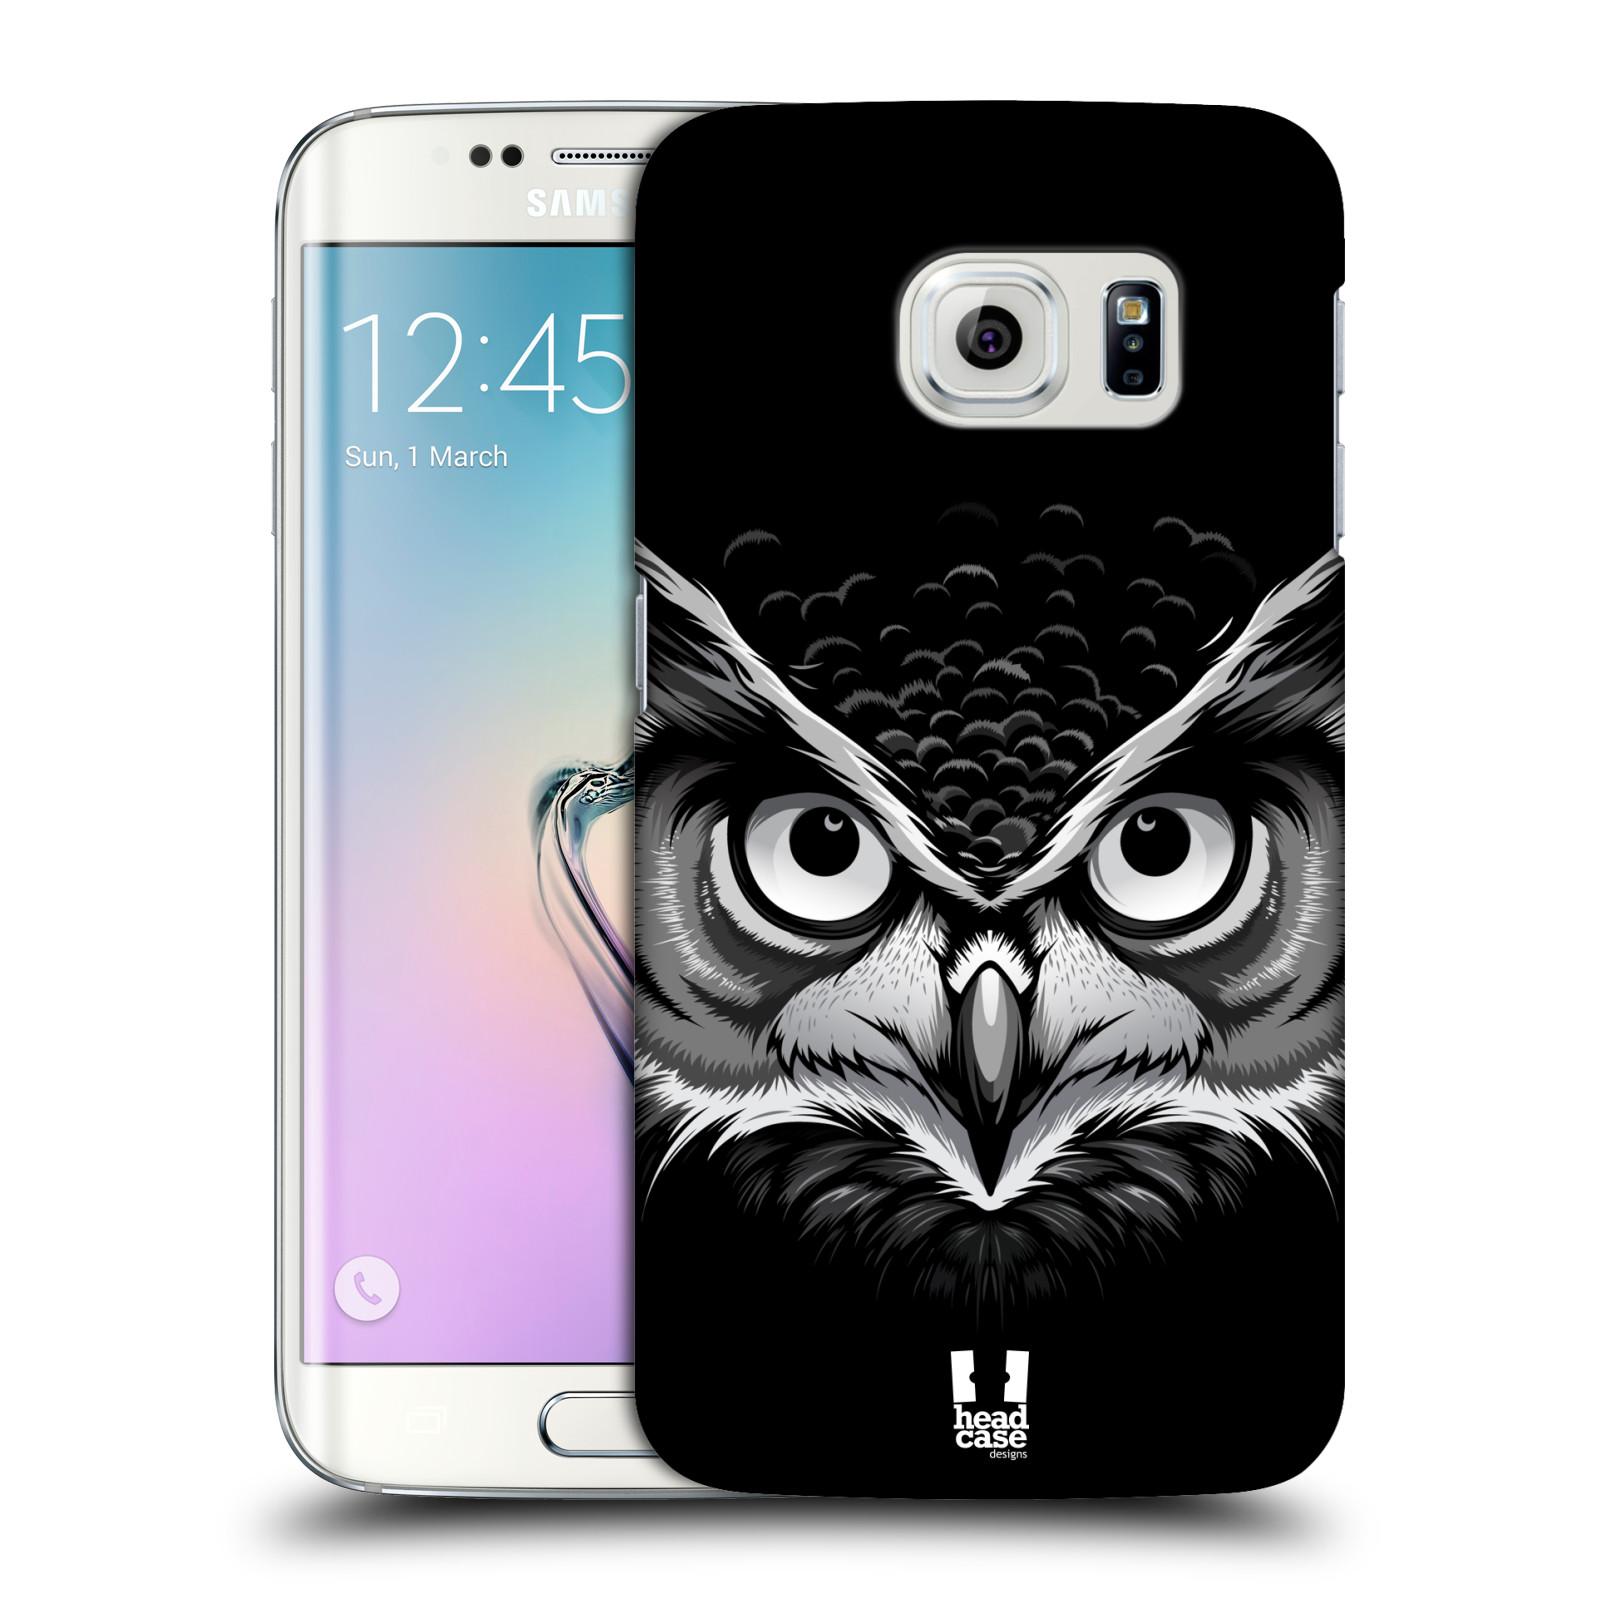 HEAD CASE plastový obal na mobil SAMSUNG Galaxy S6 EDGE (G9250, G925, G925F) vzor Zvíře kreslená tvář 2 sova